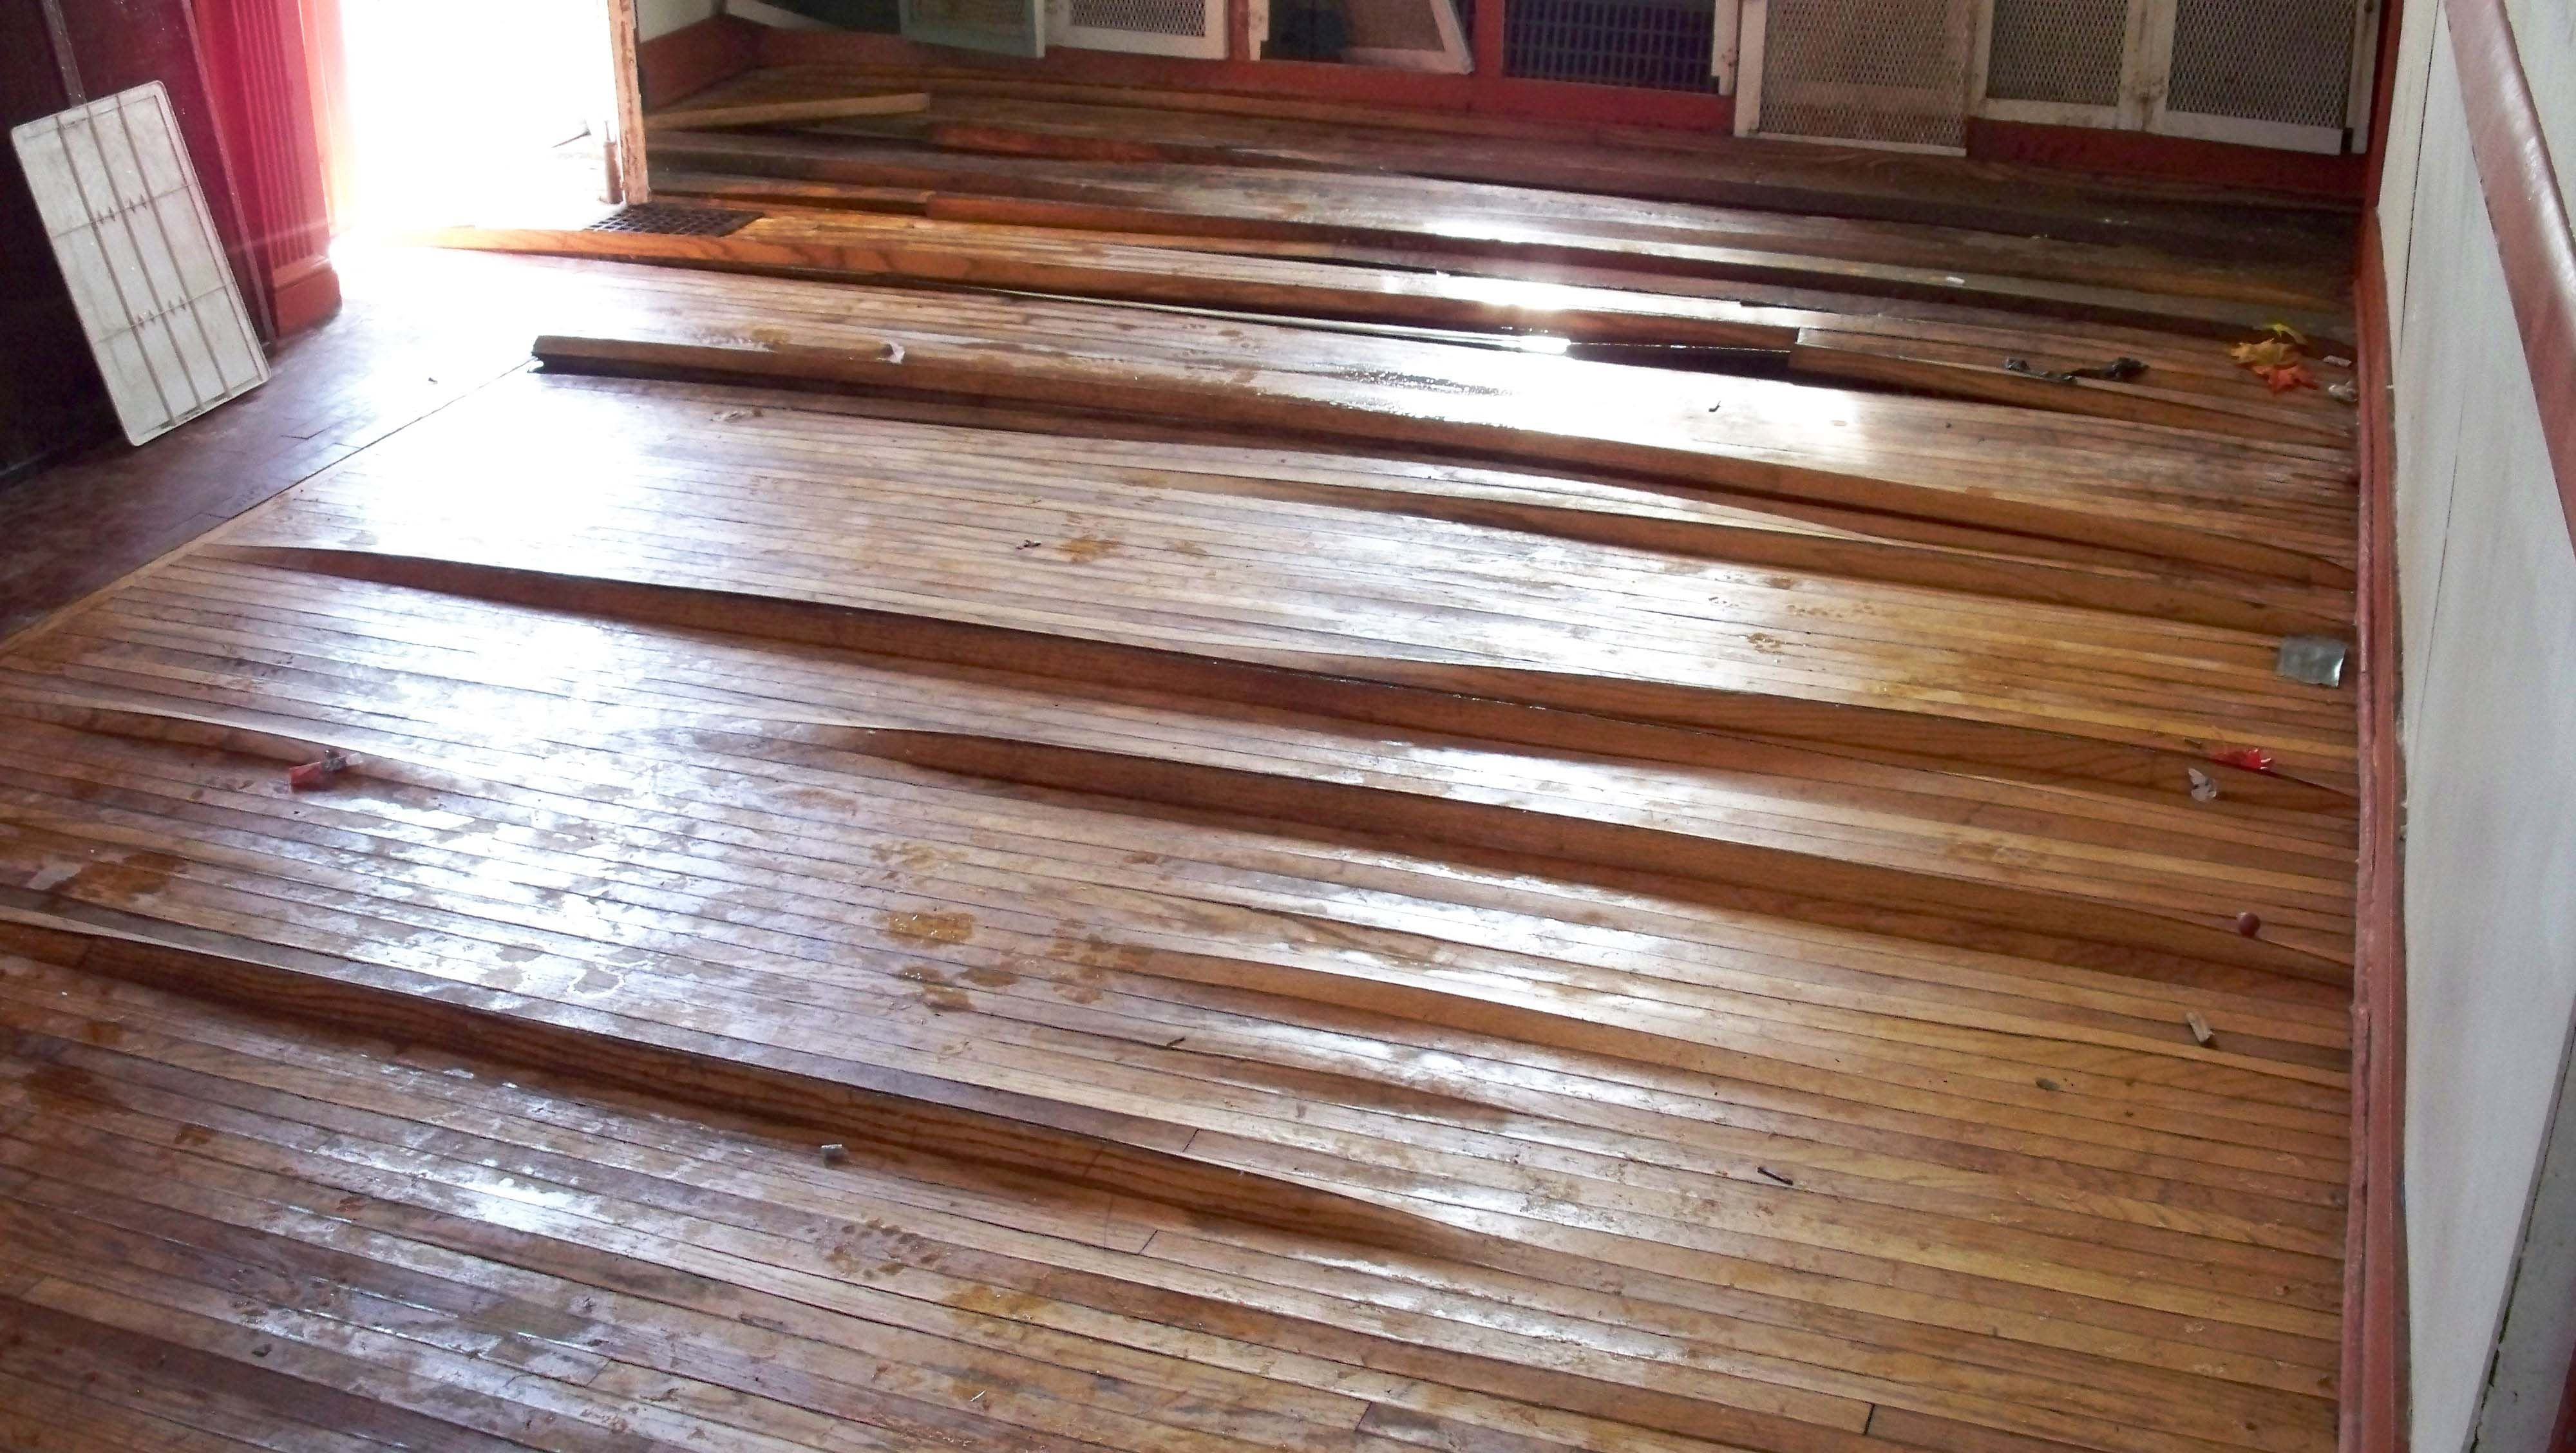 how to make hardwood floors shine of hardwood floor water damage warping hardwood floors pinterest pertaining to hardwood floor water damage warping